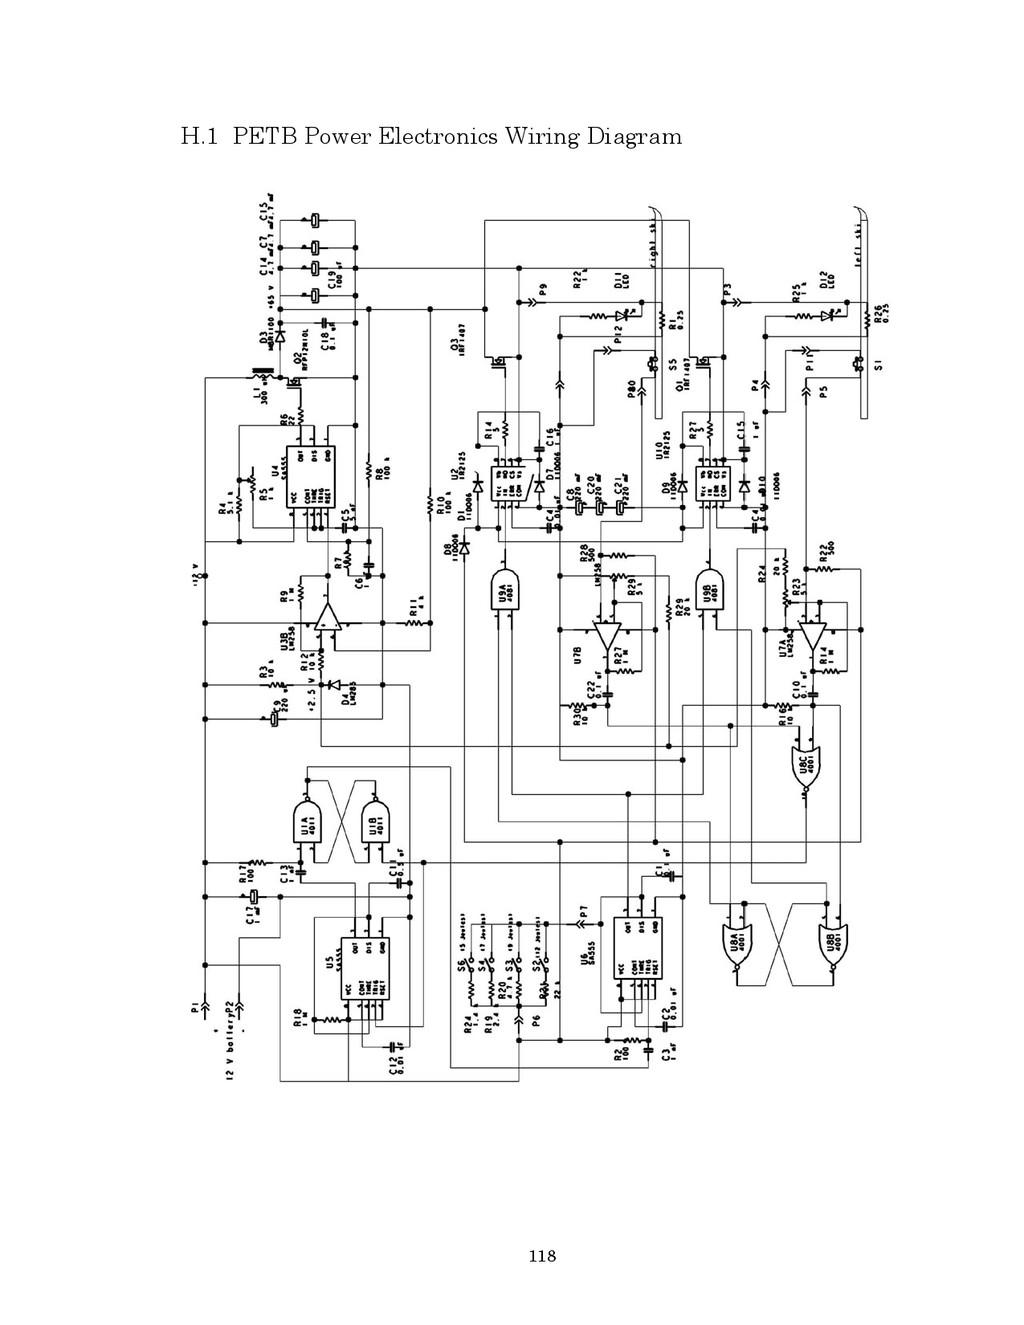 118 H.1 PETB Power Electronics Wiring Diagram